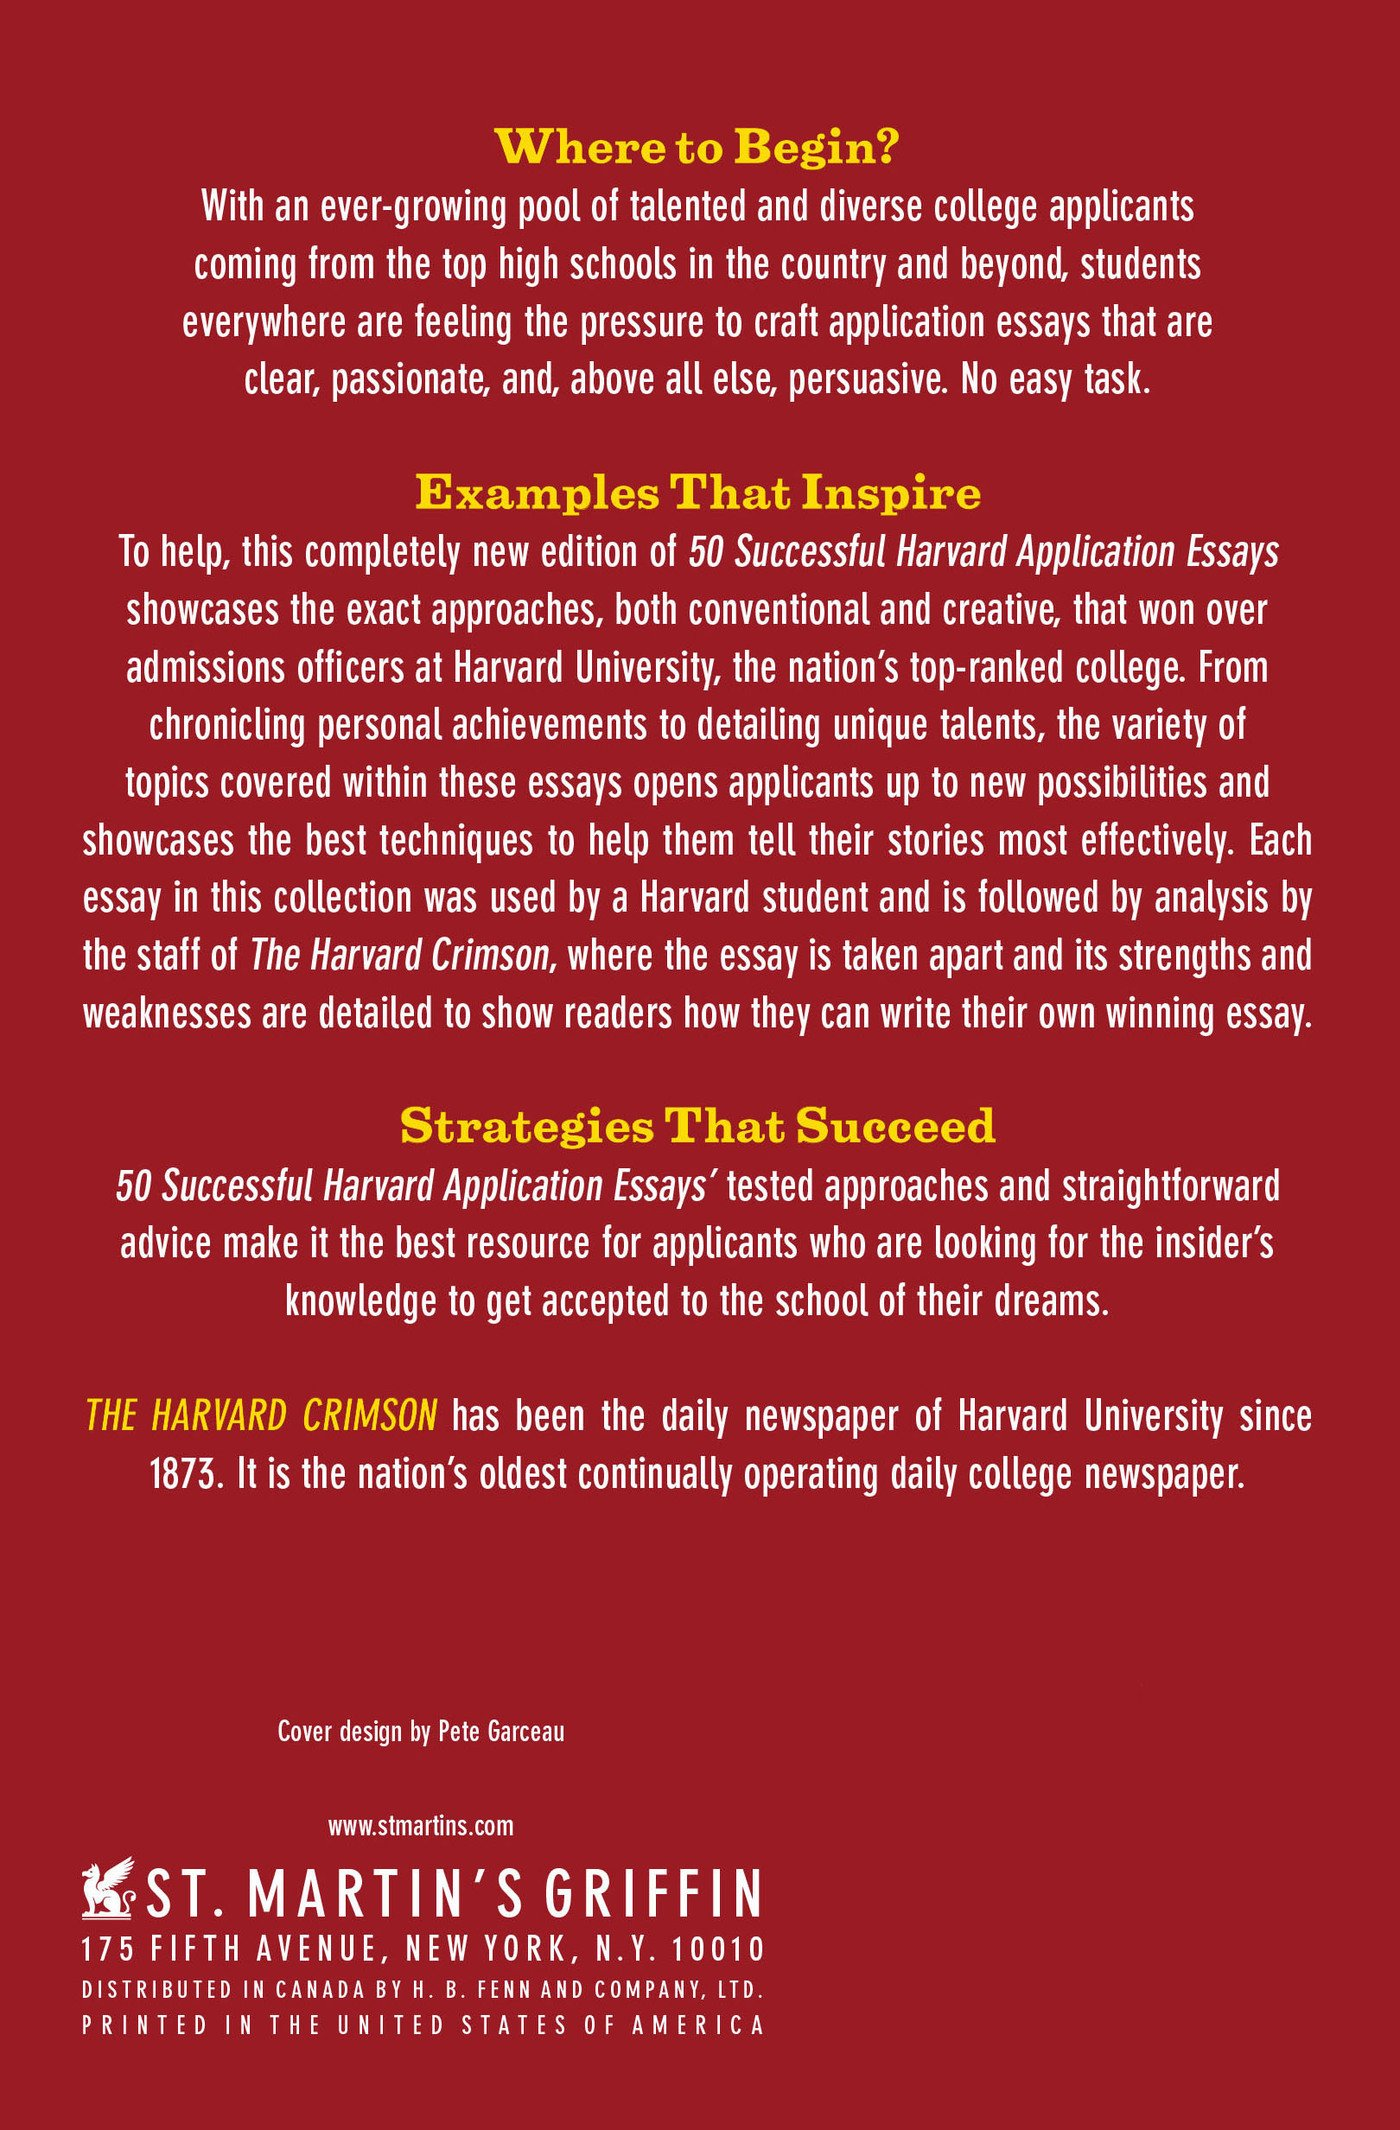 013 815kp6cfuhl Harvard Accepted Essays Essay Fantastic Business School Reddit College Book Full